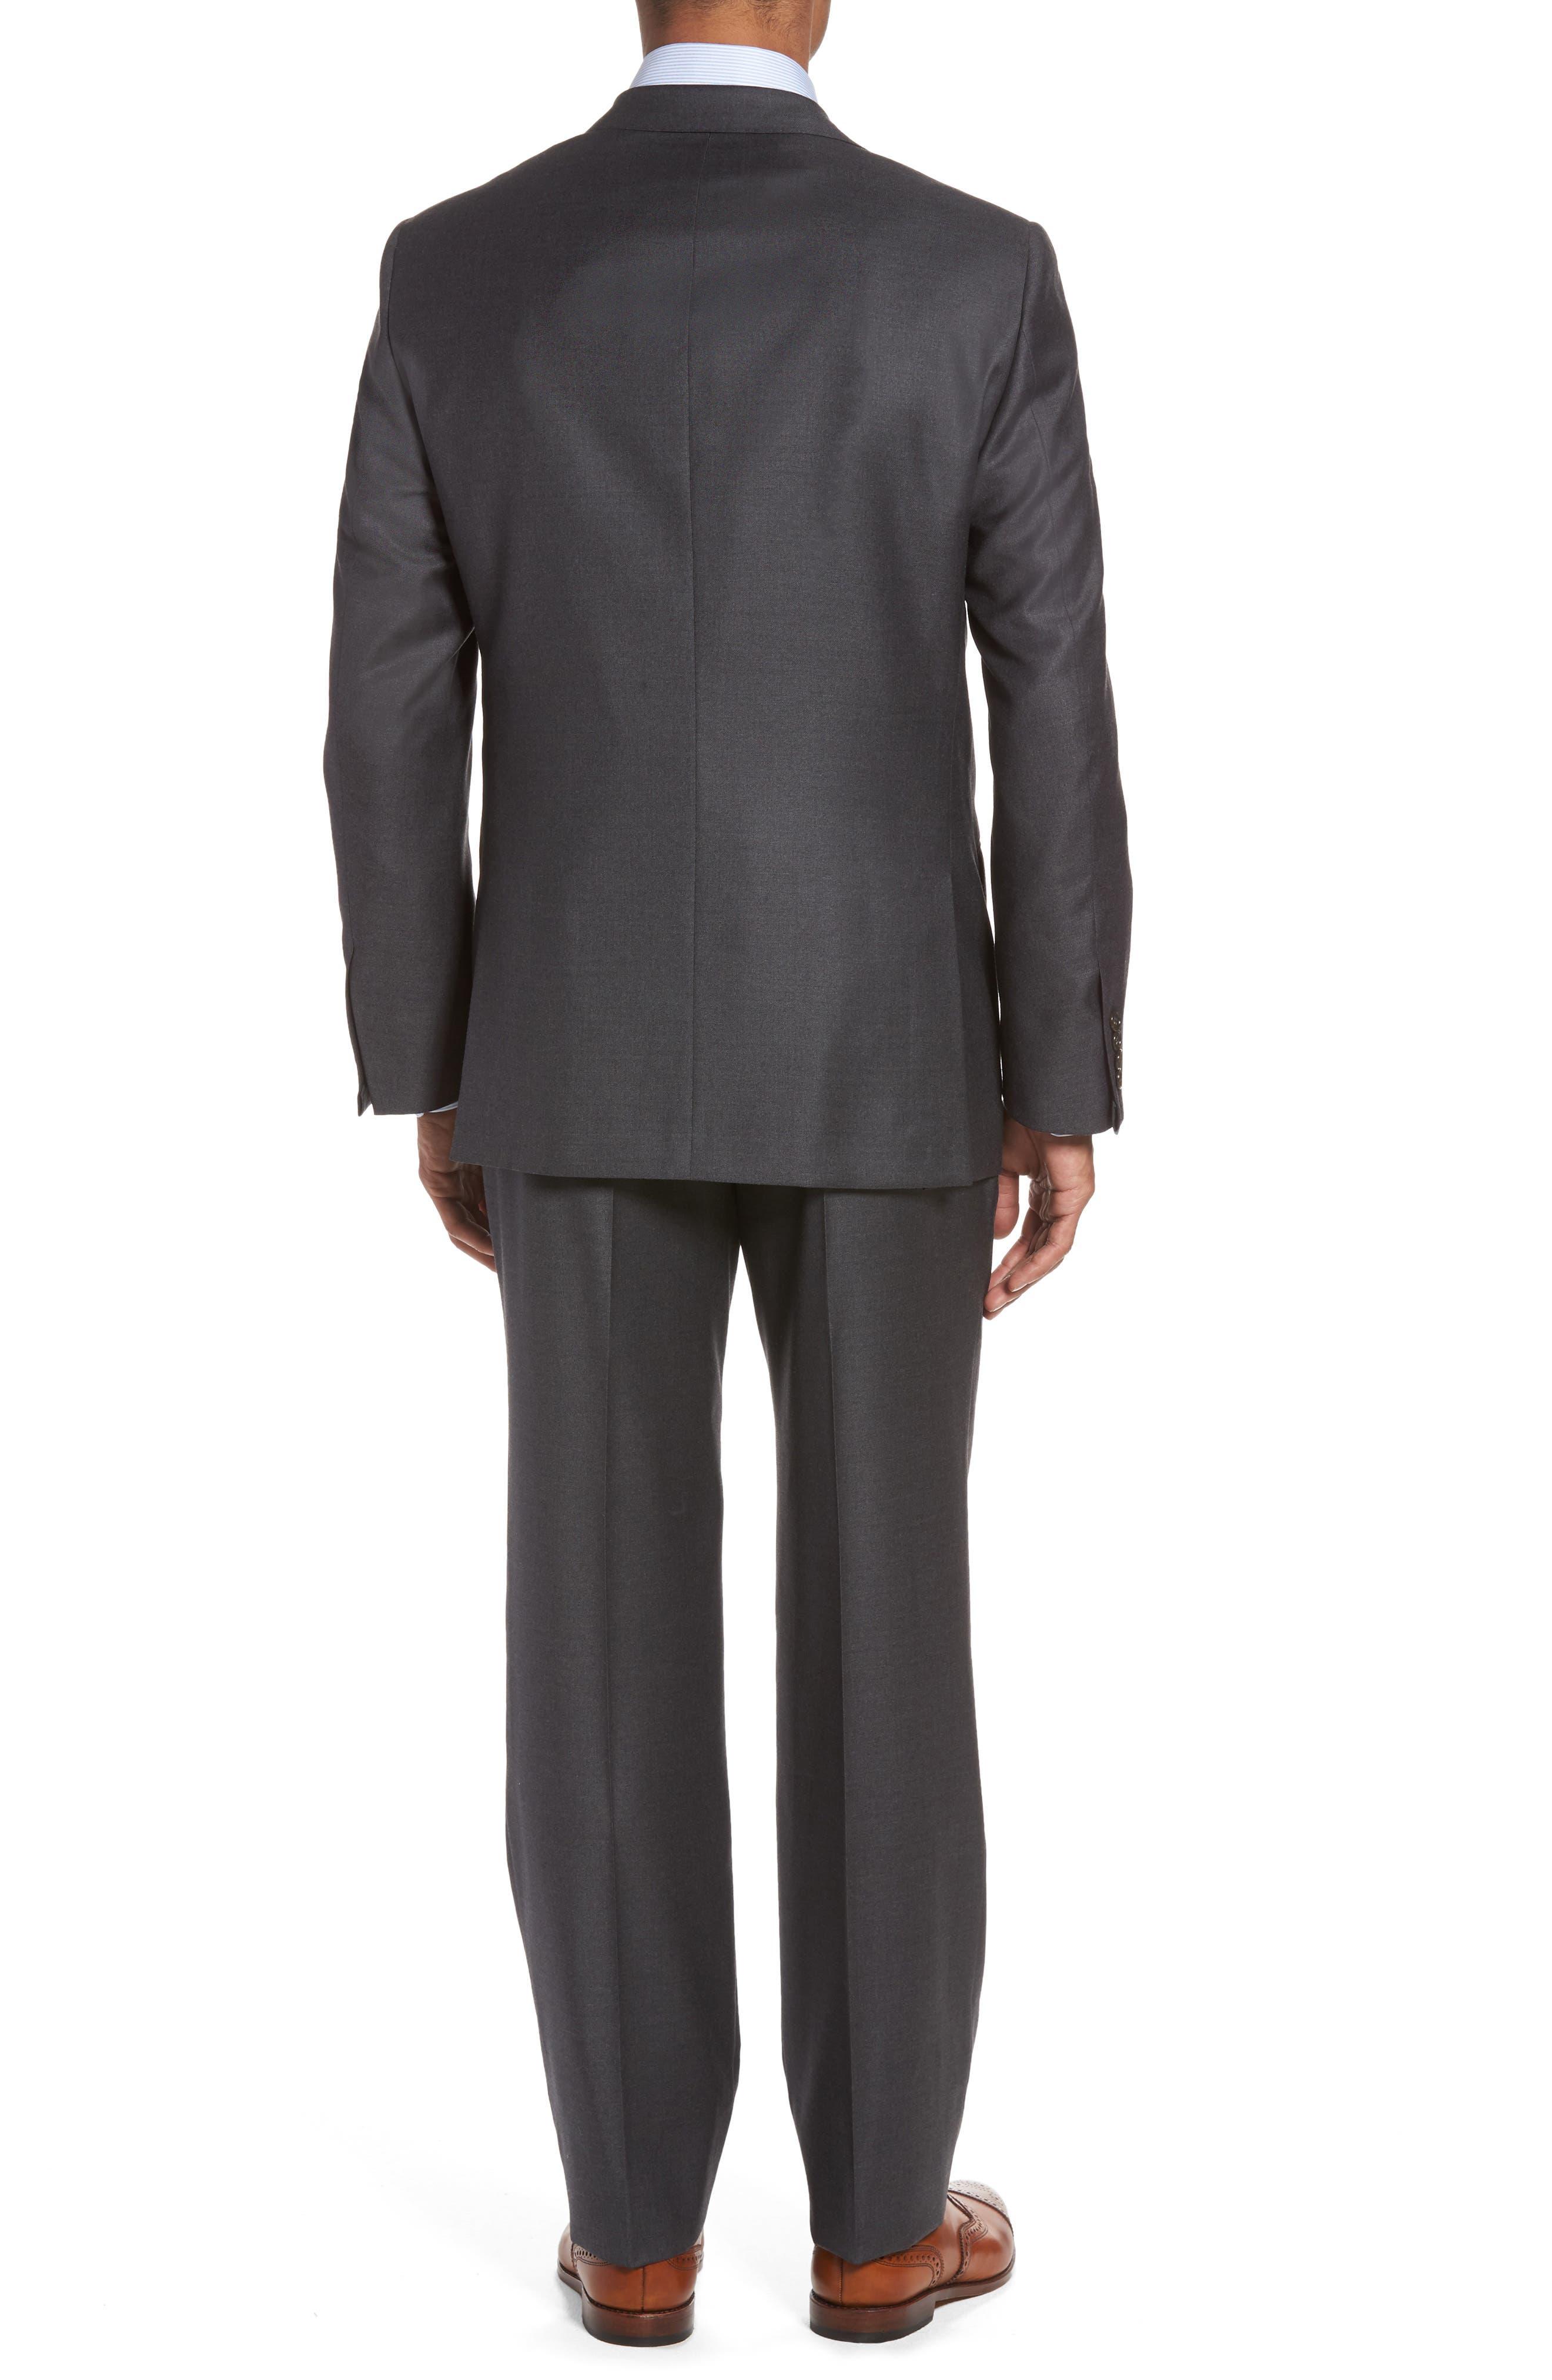 HICKEY FREEMAN, Classic B Fit Loro Piana Wool Suit, Alternate thumbnail 2, color, GREY